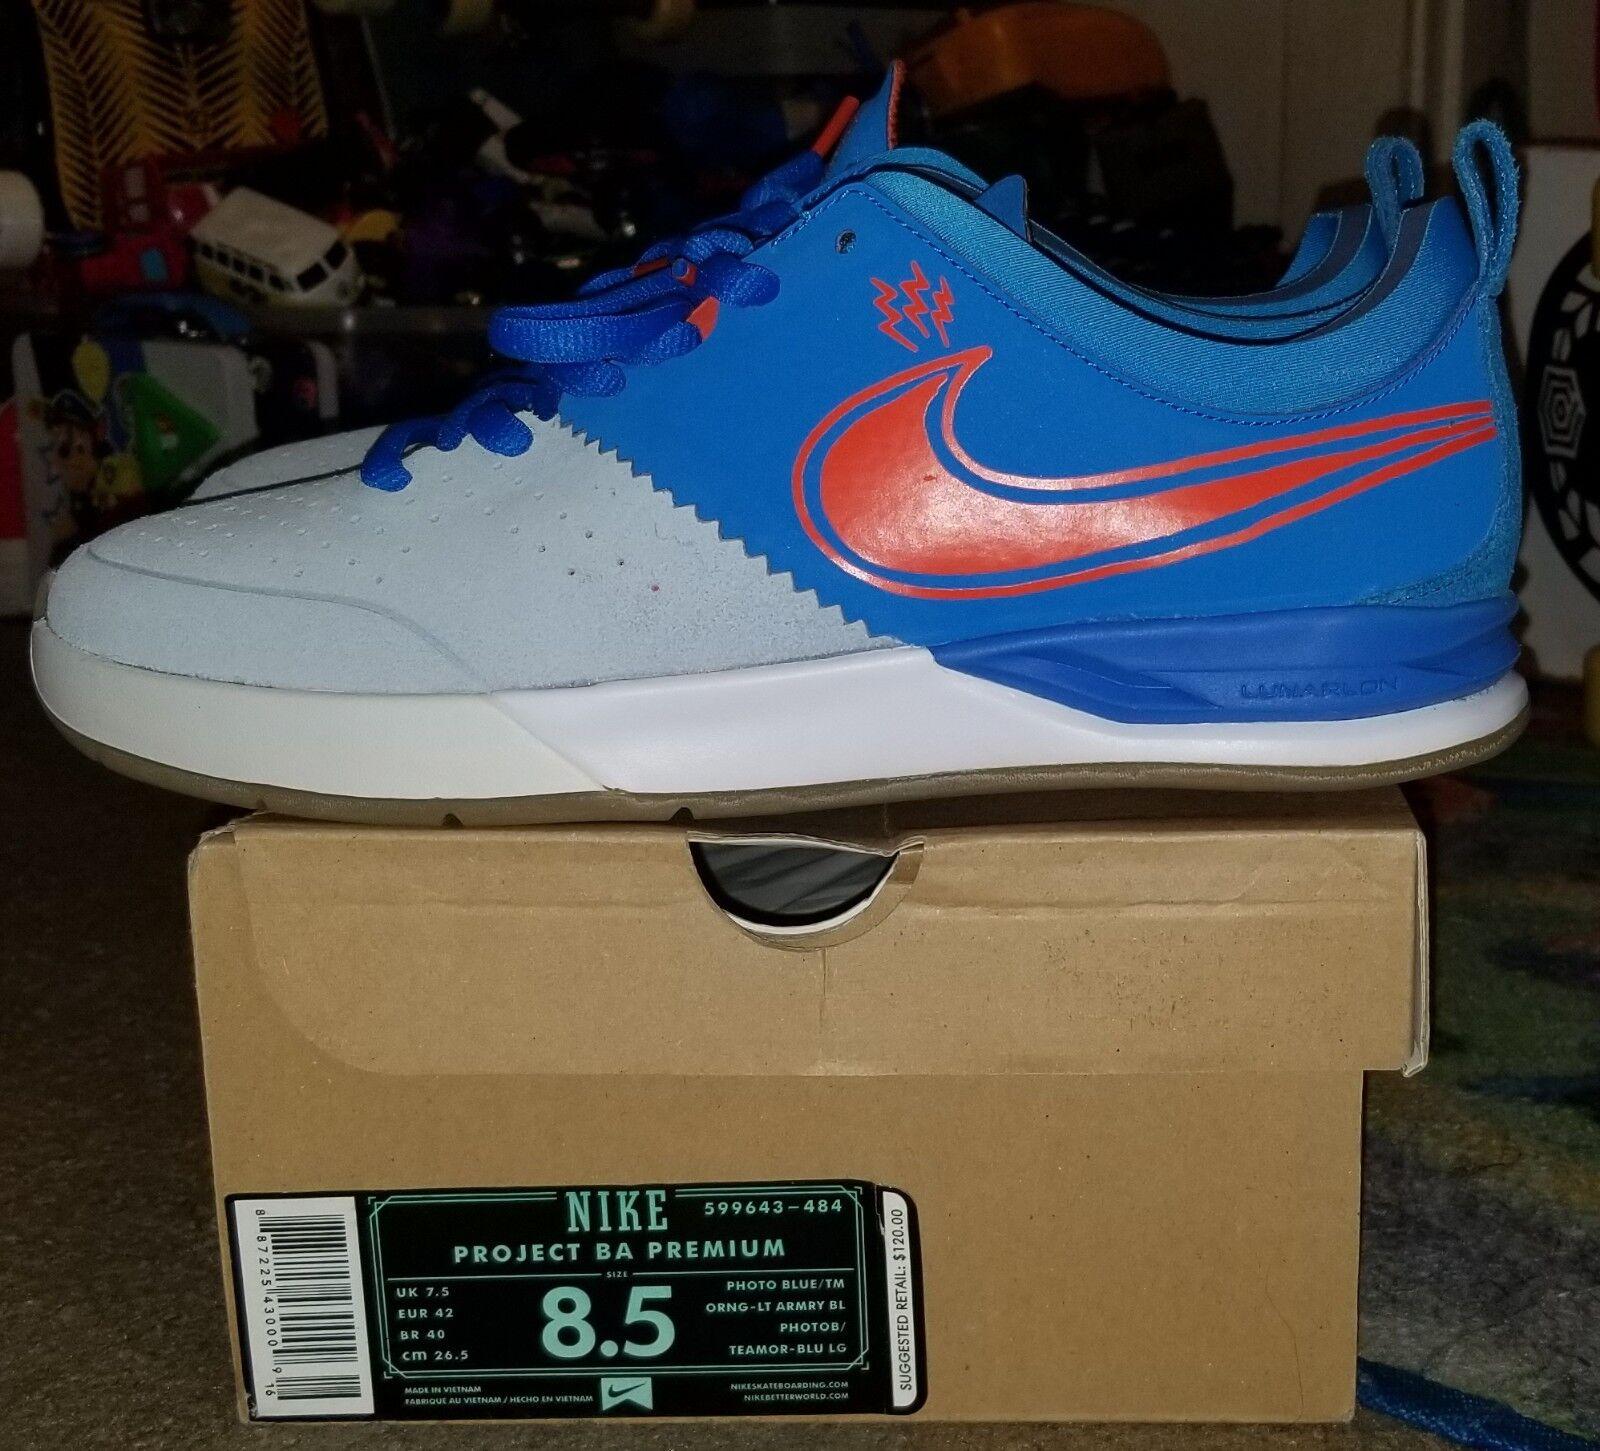 Nike Sb Project Ba Premium Sz 8.5 Vnds Koston Rodriguez nyjah malto